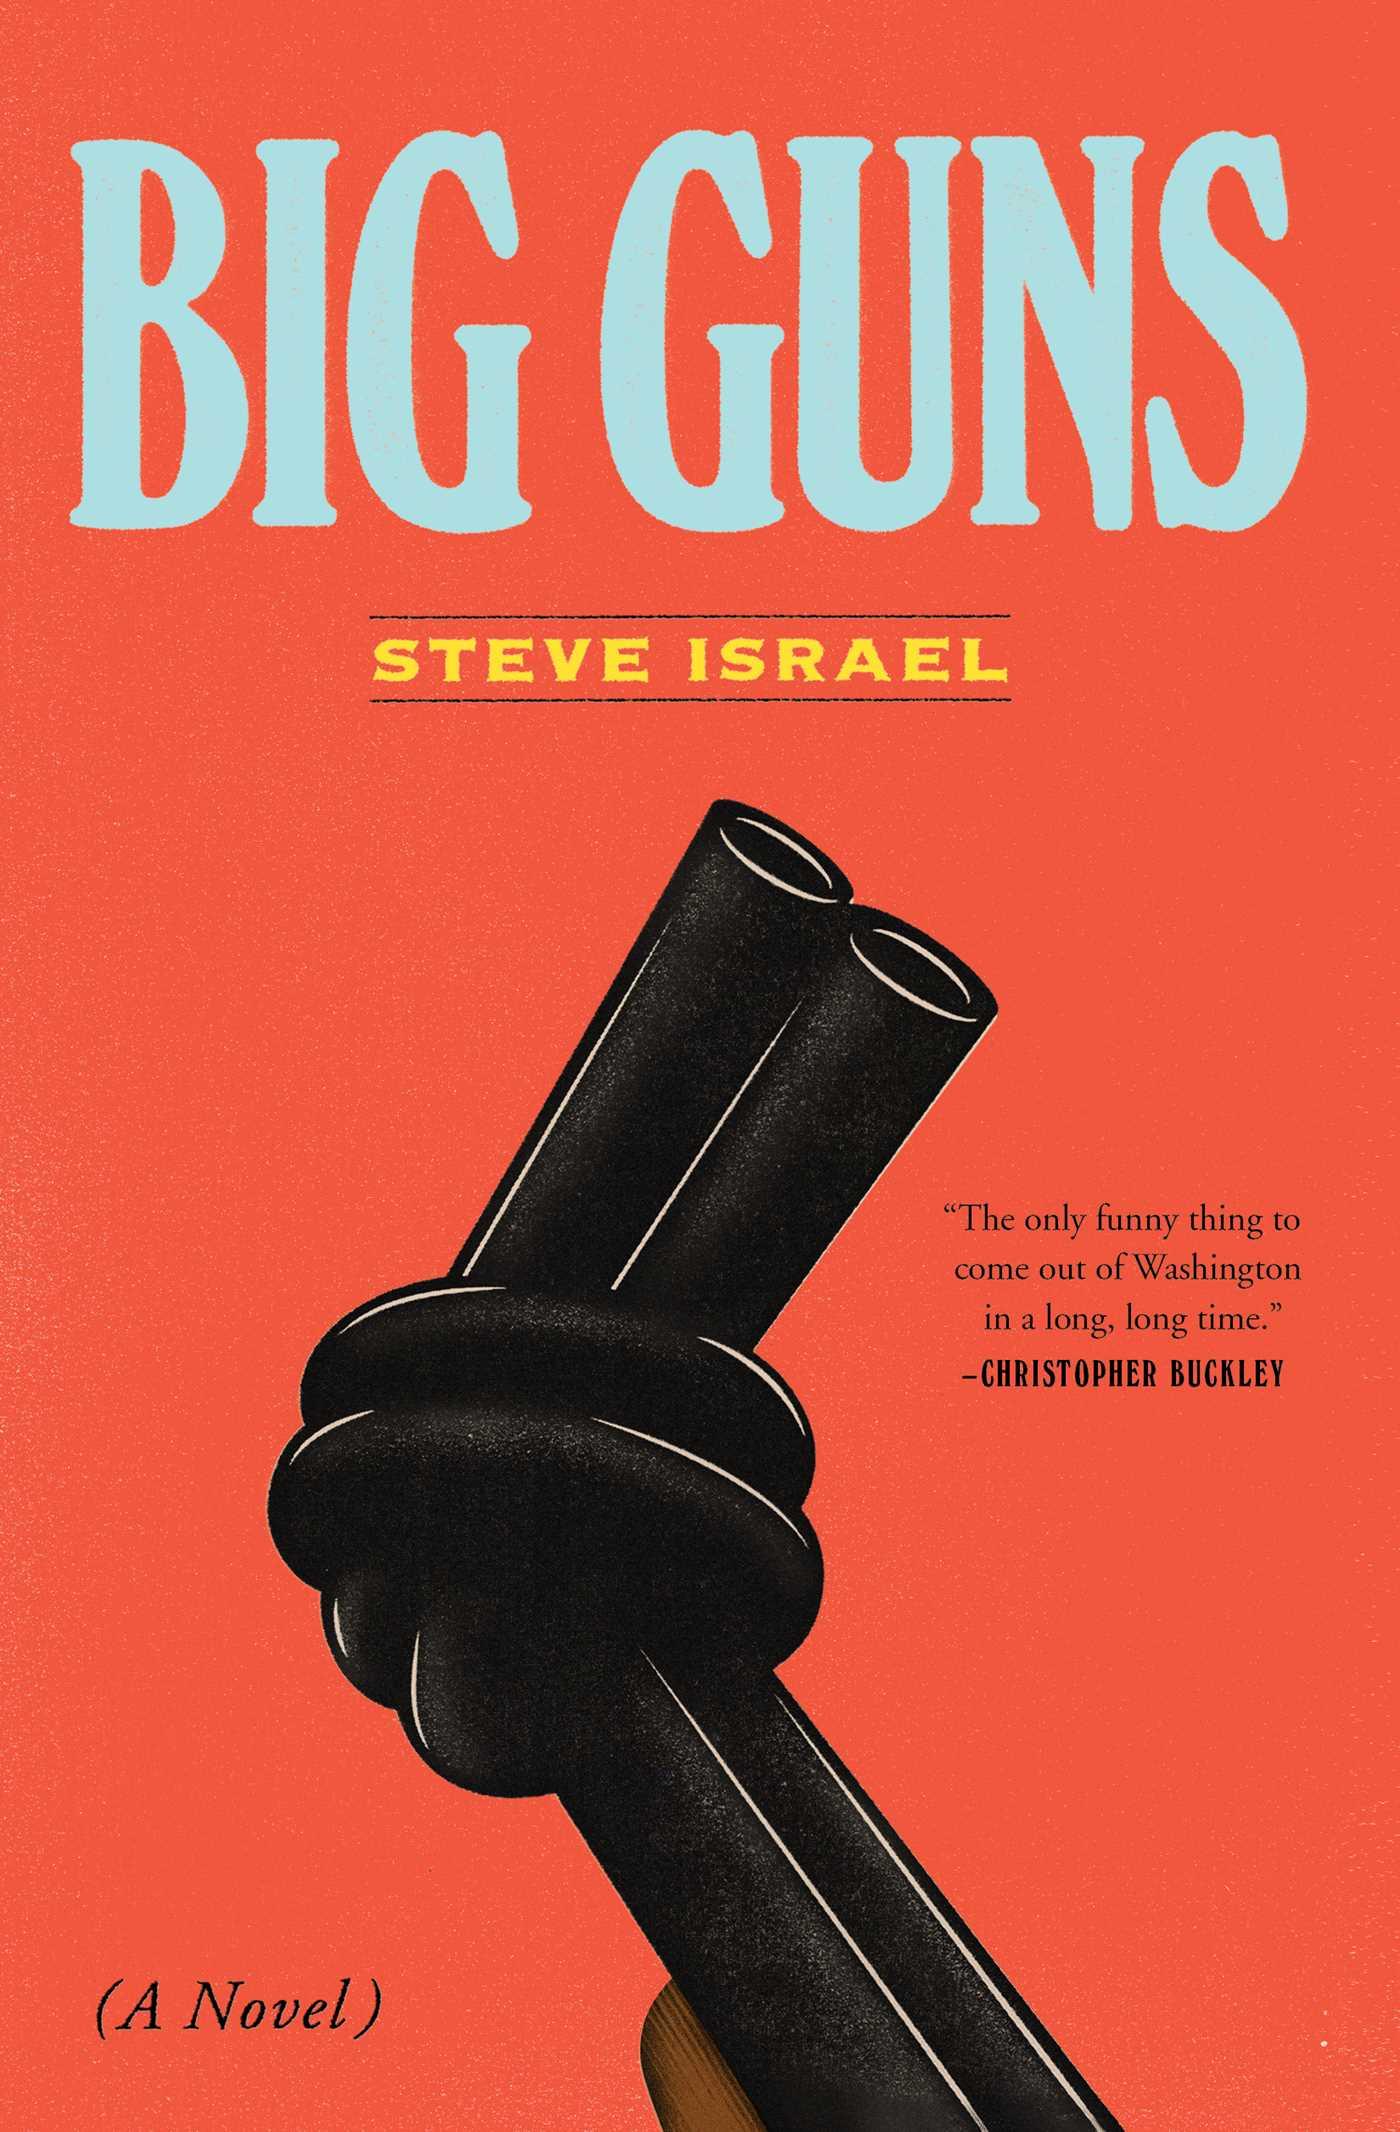 Big guns 9781501118036 hr